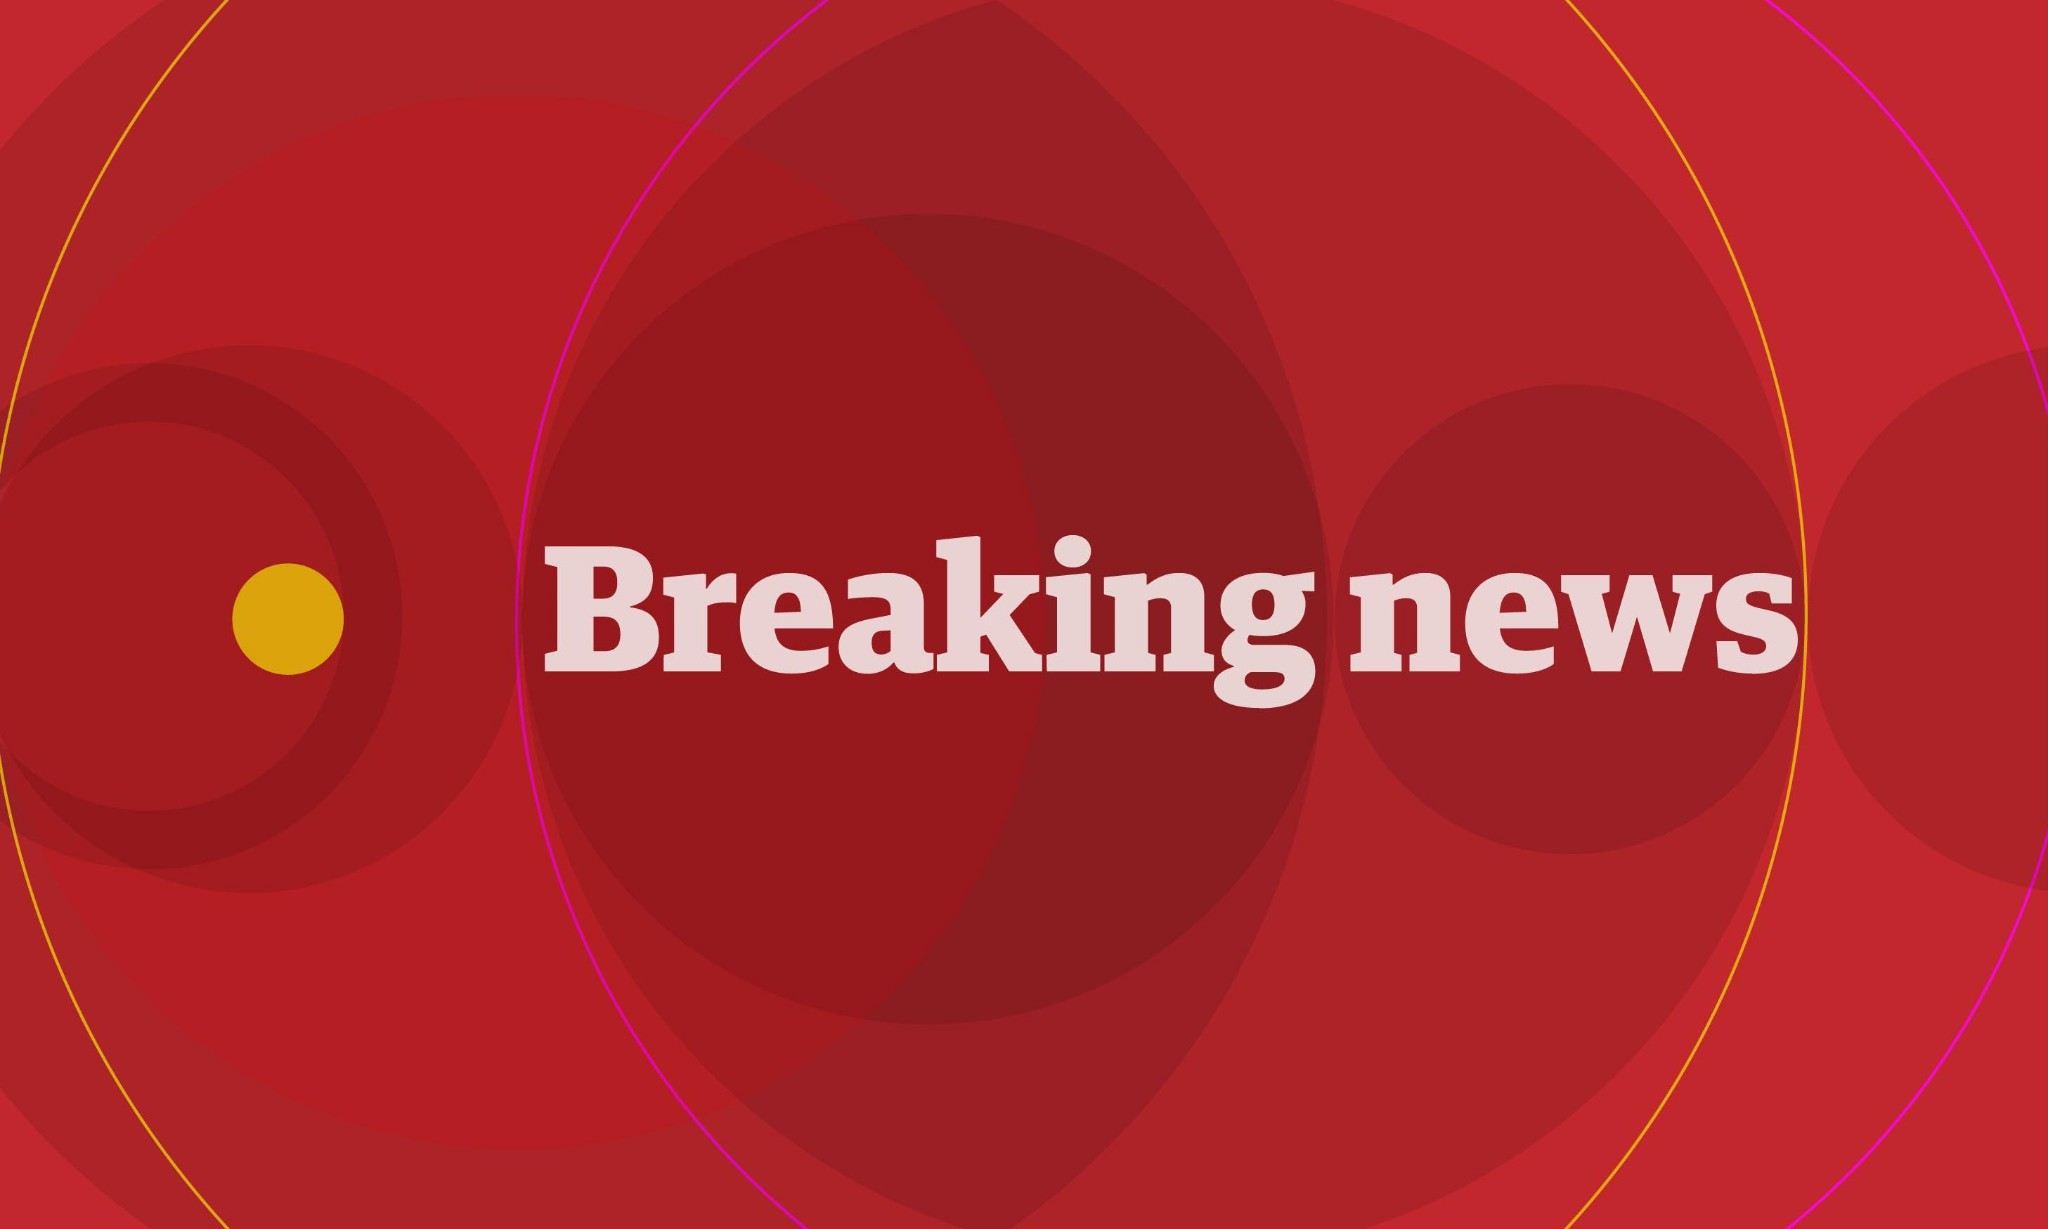 Mexico earthquake kills at least 61 and sparks mass evacuations